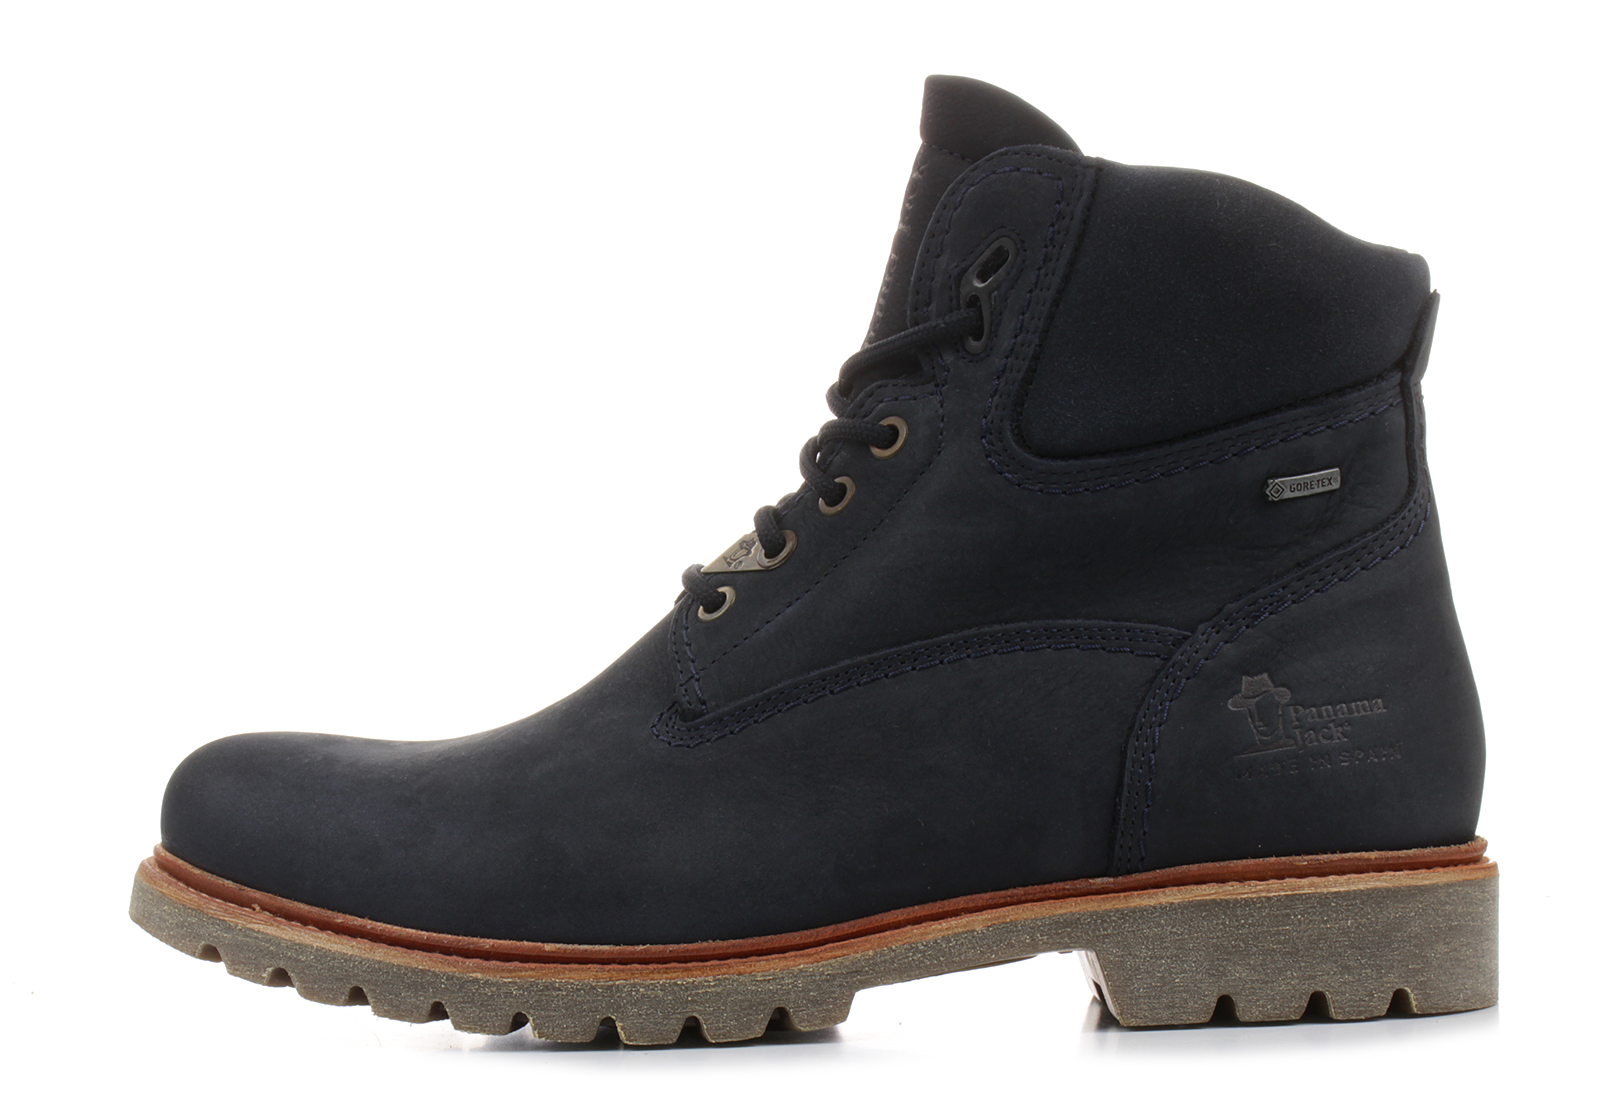 panama jack boots amur gtx amur c14 online shop for sneakers shoes and boots. Black Bedroom Furniture Sets. Home Design Ideas